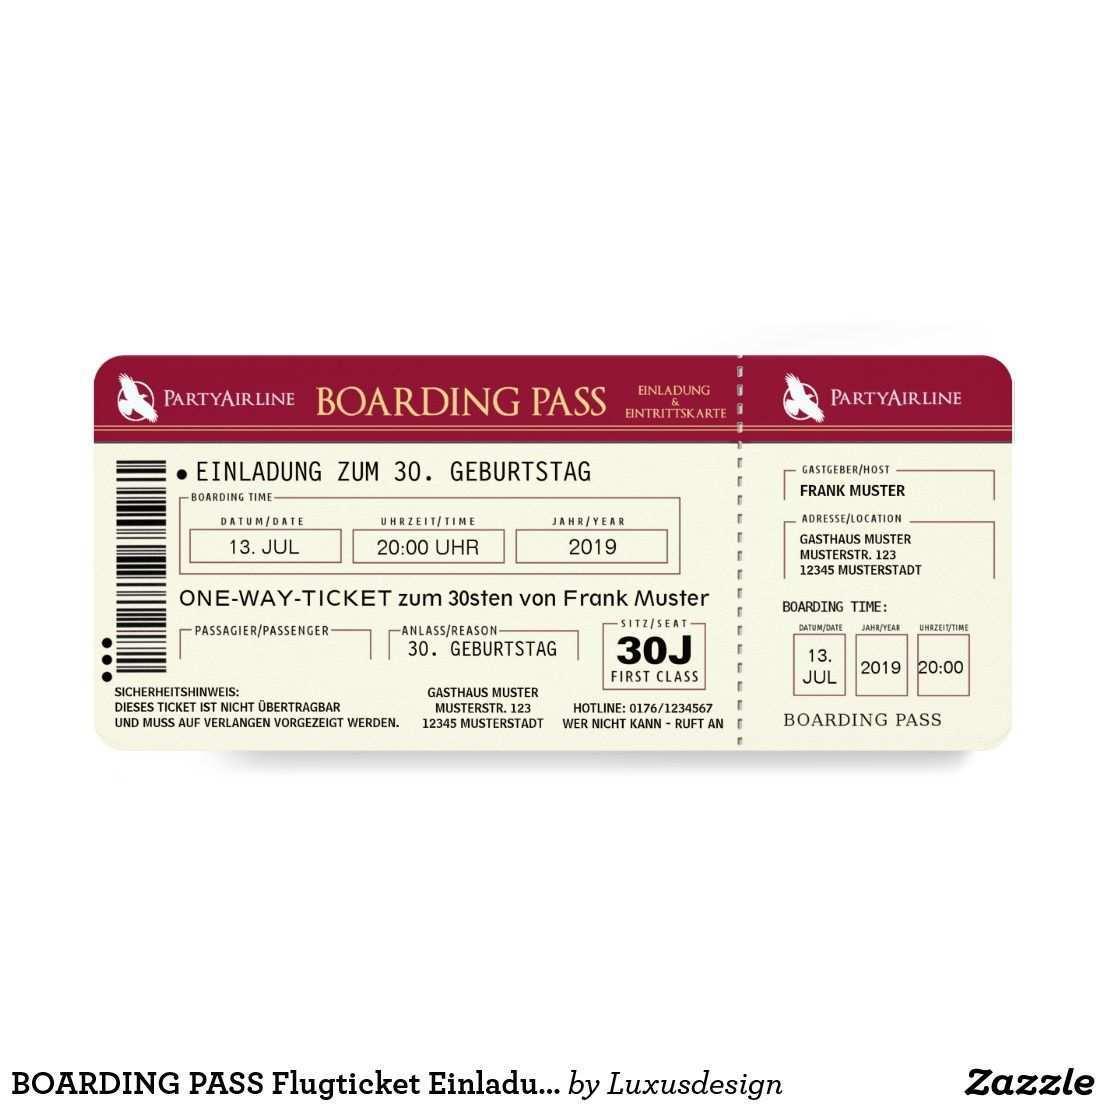 Boarding Pass Plane Ticket Invitation Map Red Zazzle Com Plane Ticket Invitation Plane Tickets Ticket Invitation